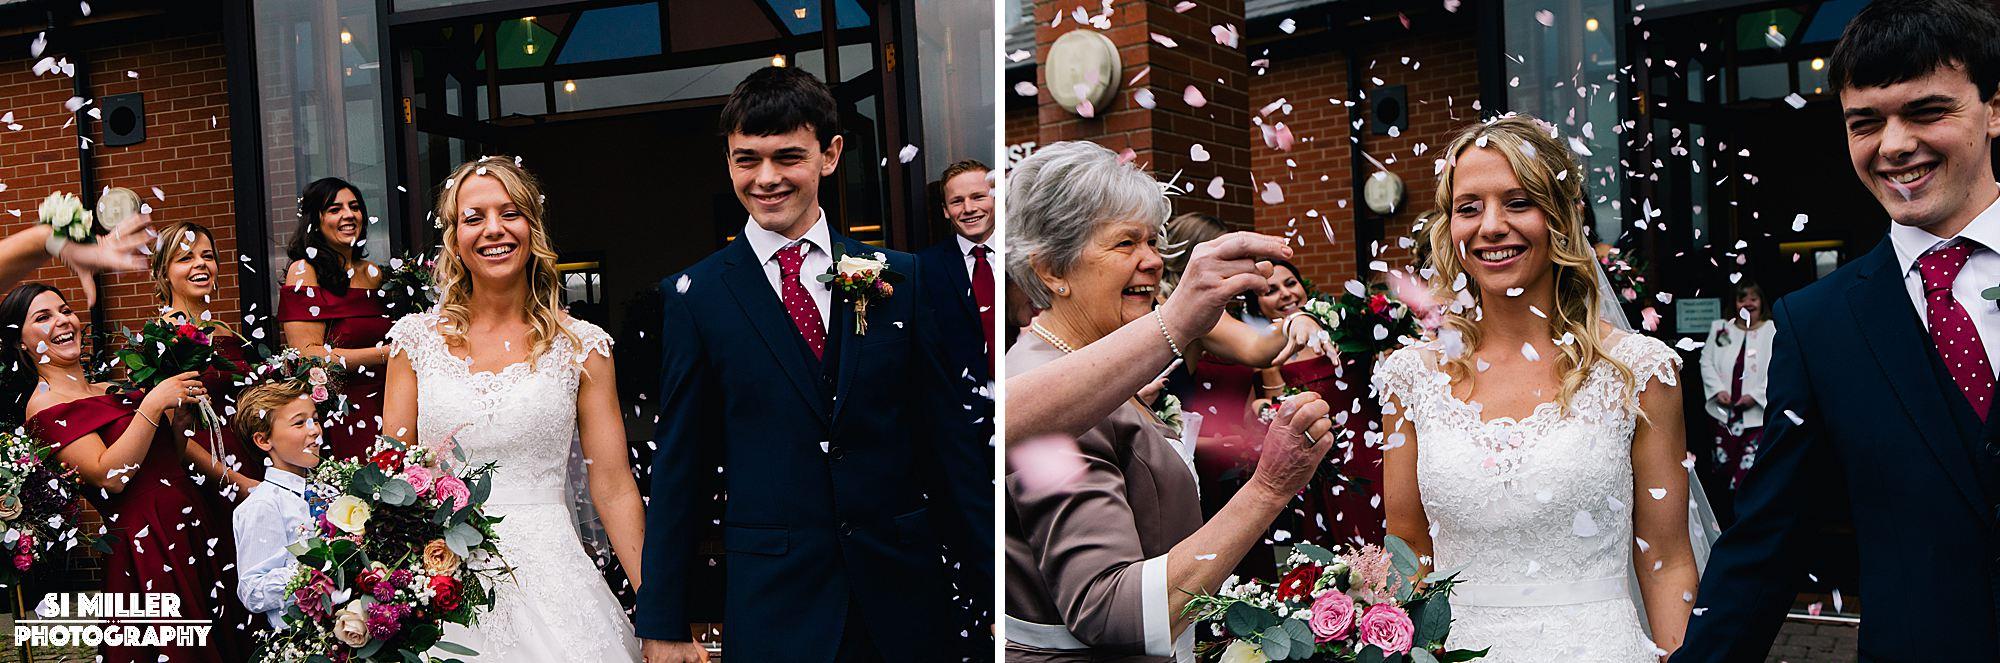 Confetti being thrown over bride and groom crown lane free methodist wedding photographer preston